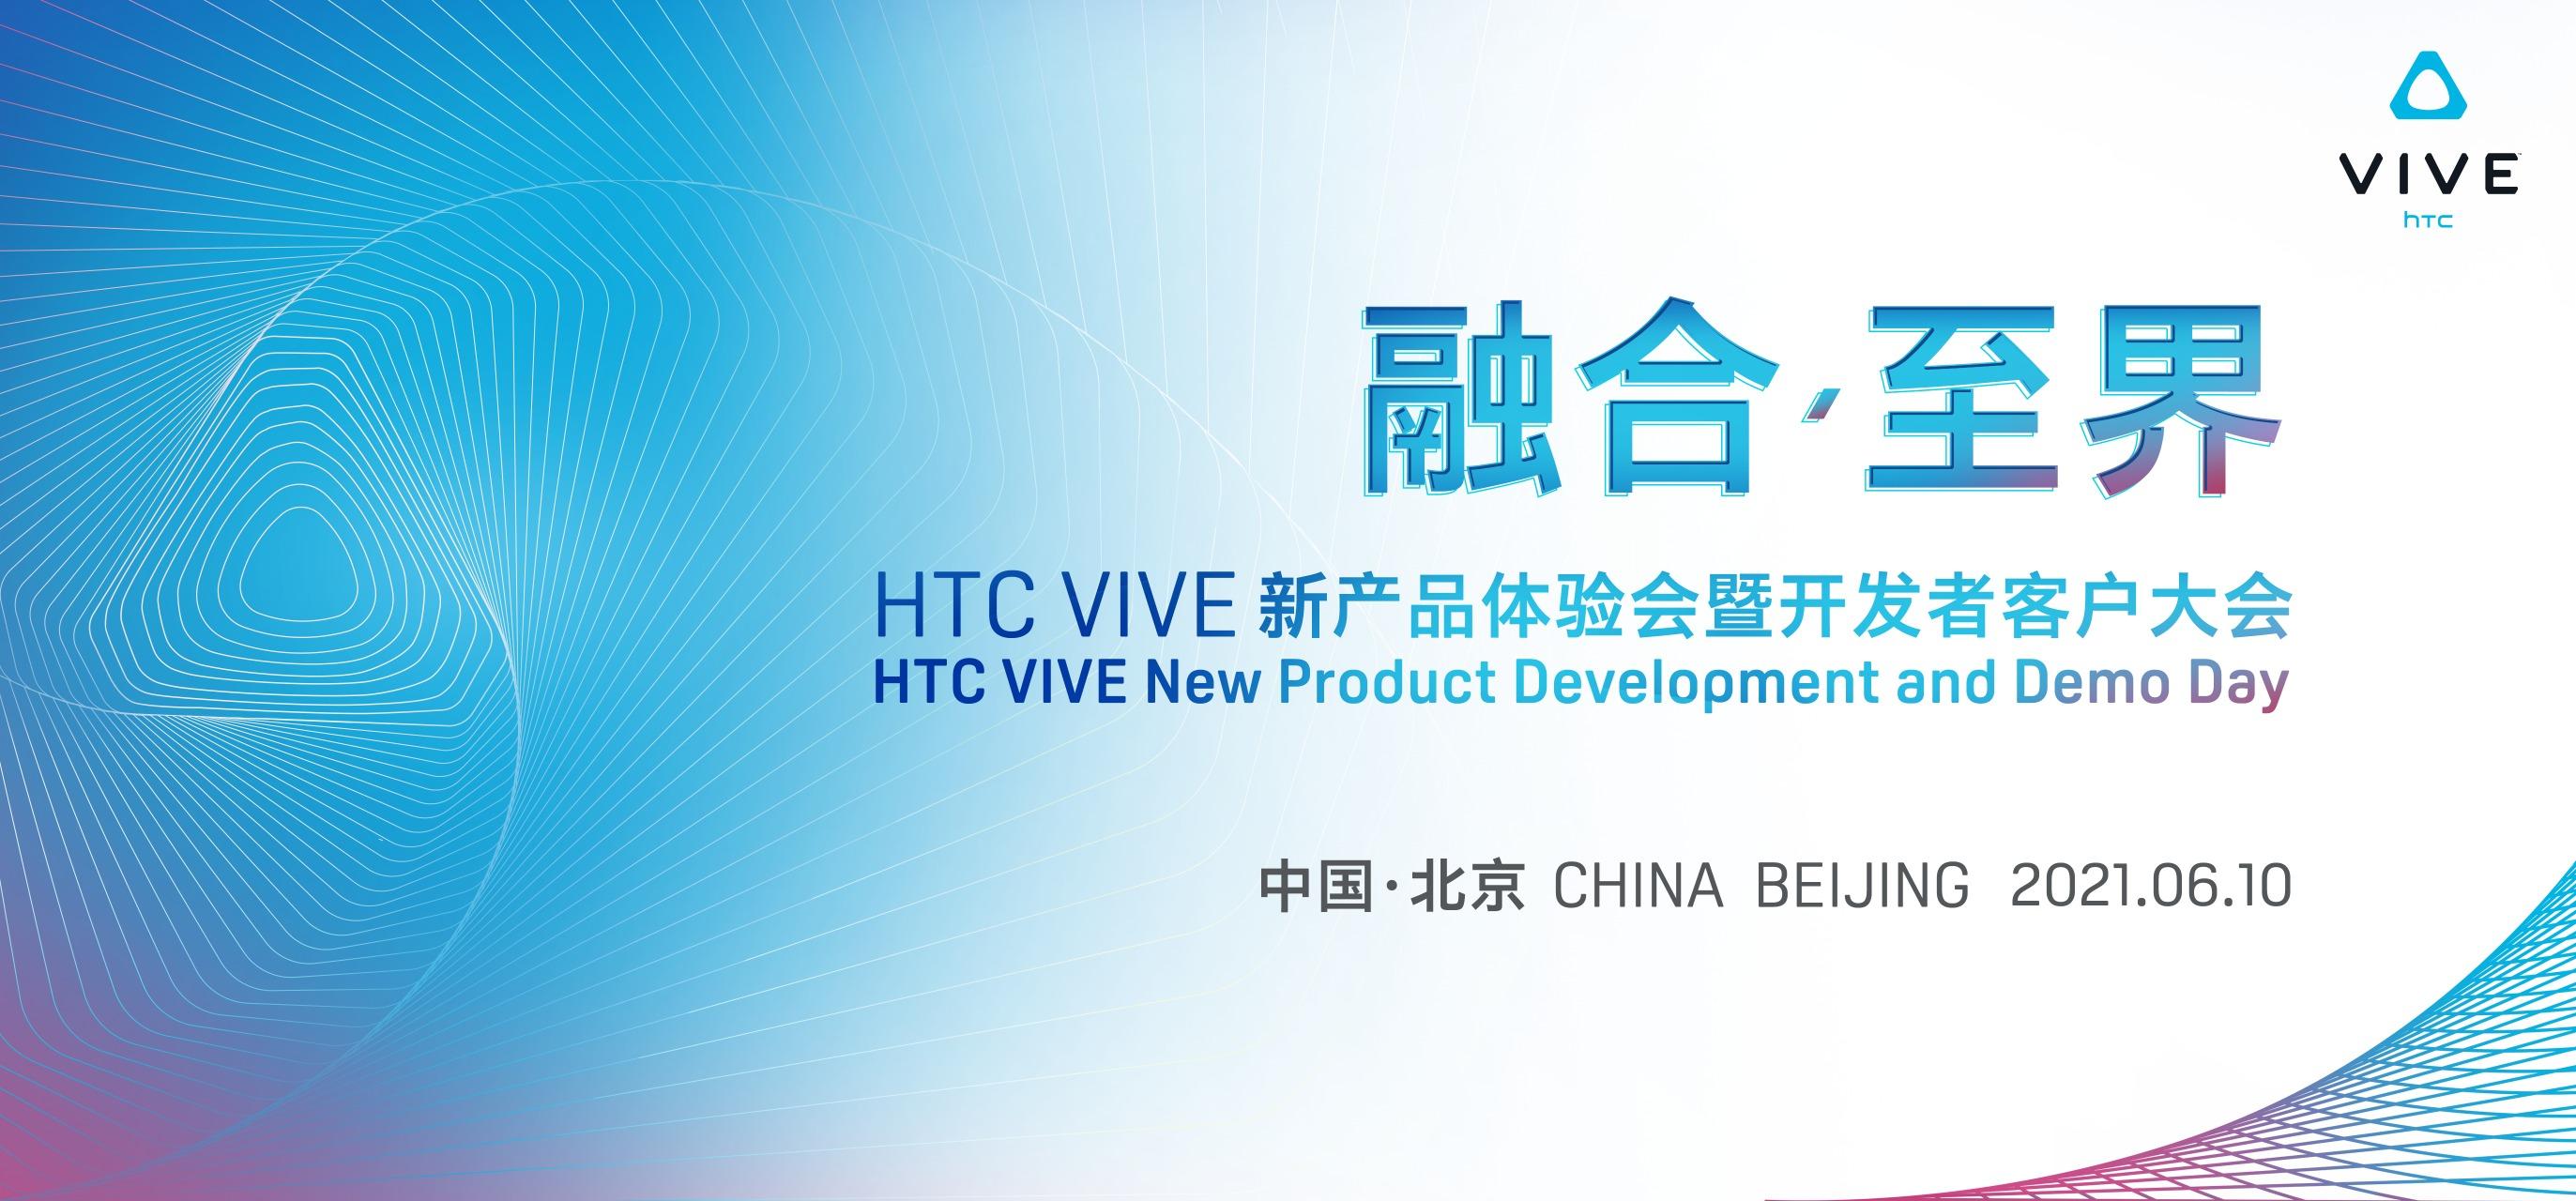 HTC VIVE 召开新品体验会暨开发者客户大会,加速XR应用落地